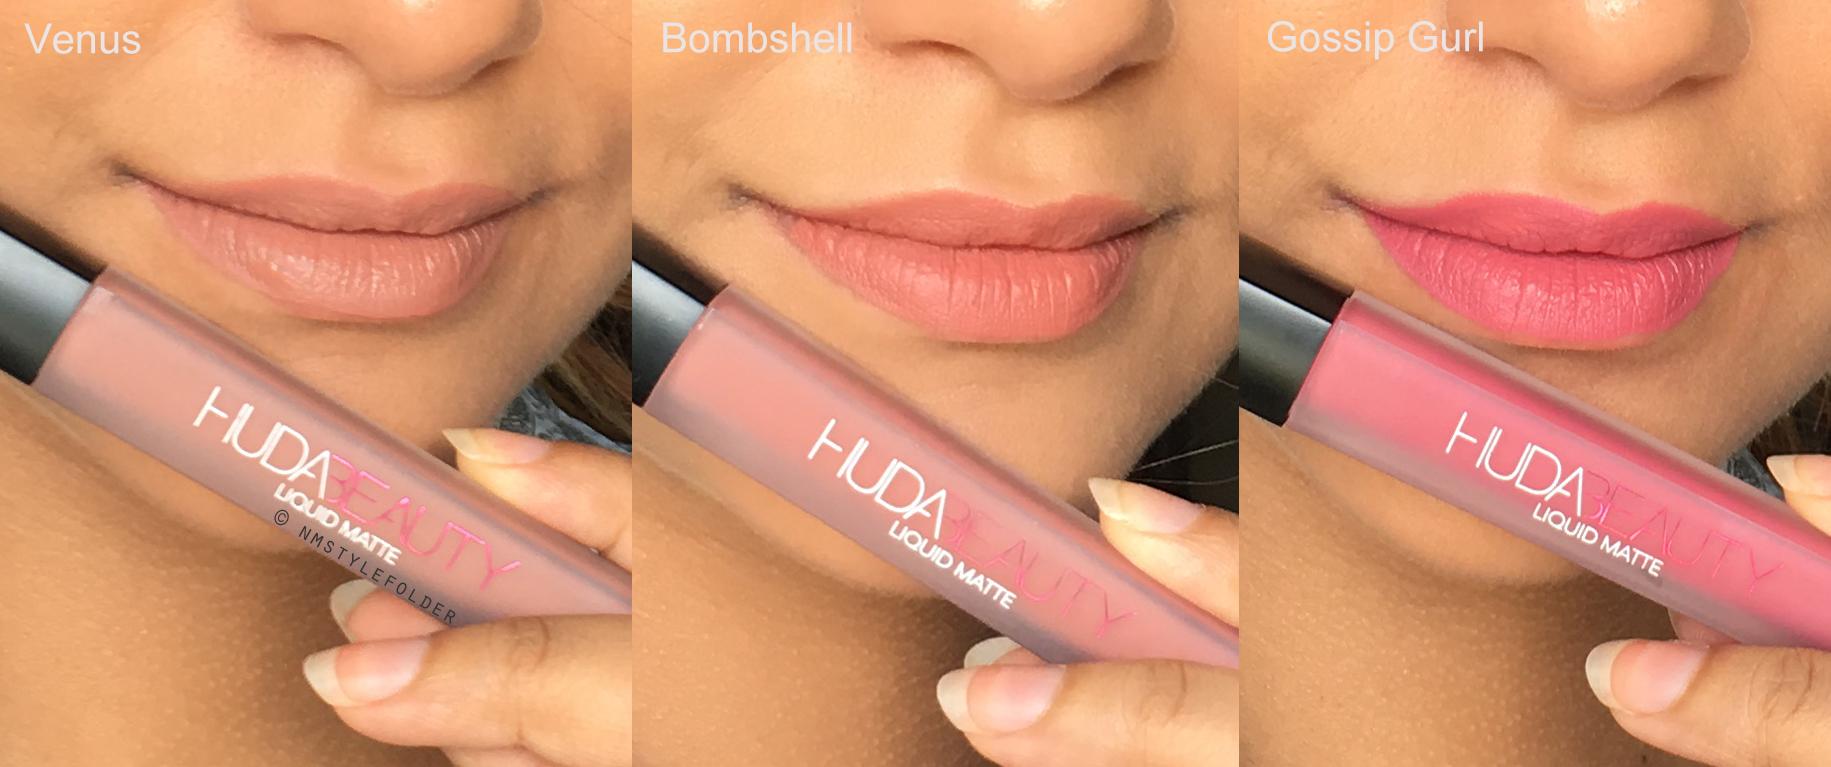 Worth The Hype Huda Beauty Liquid Lipsticks Style Folder